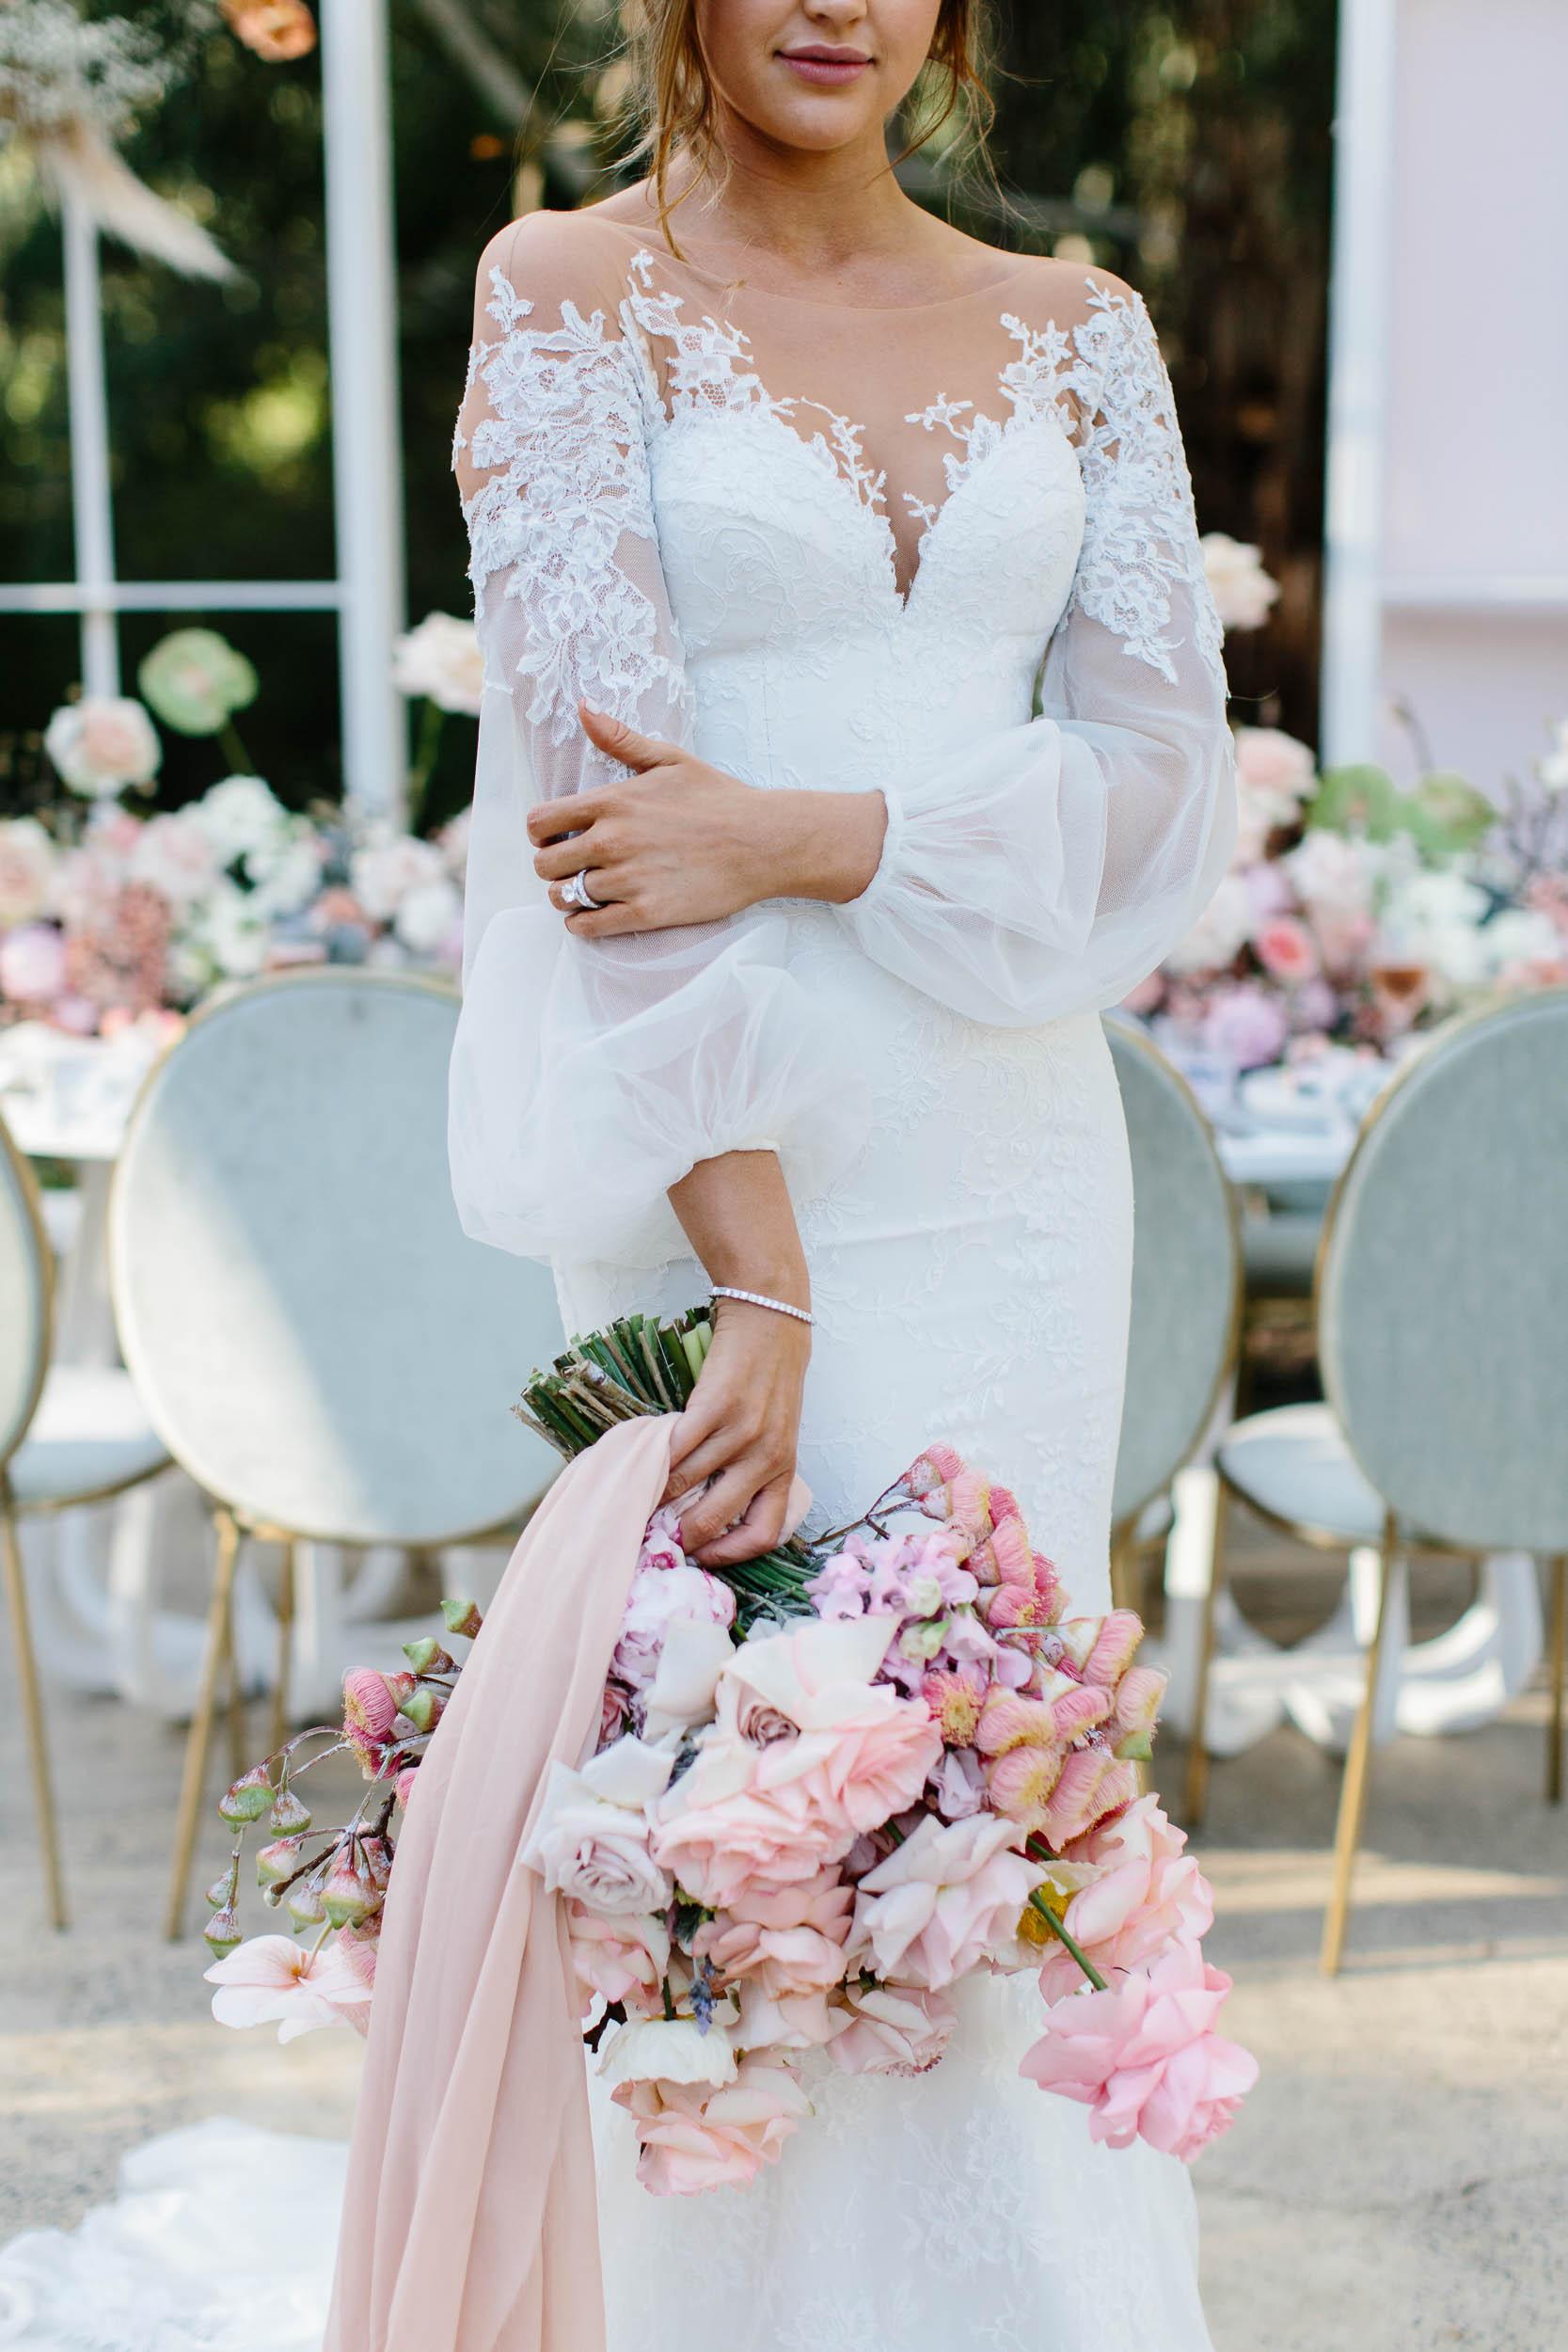 Kas-Richards-LENZO-Yarra-Valley-Wedding-One-Day-Bridal-241.jpg